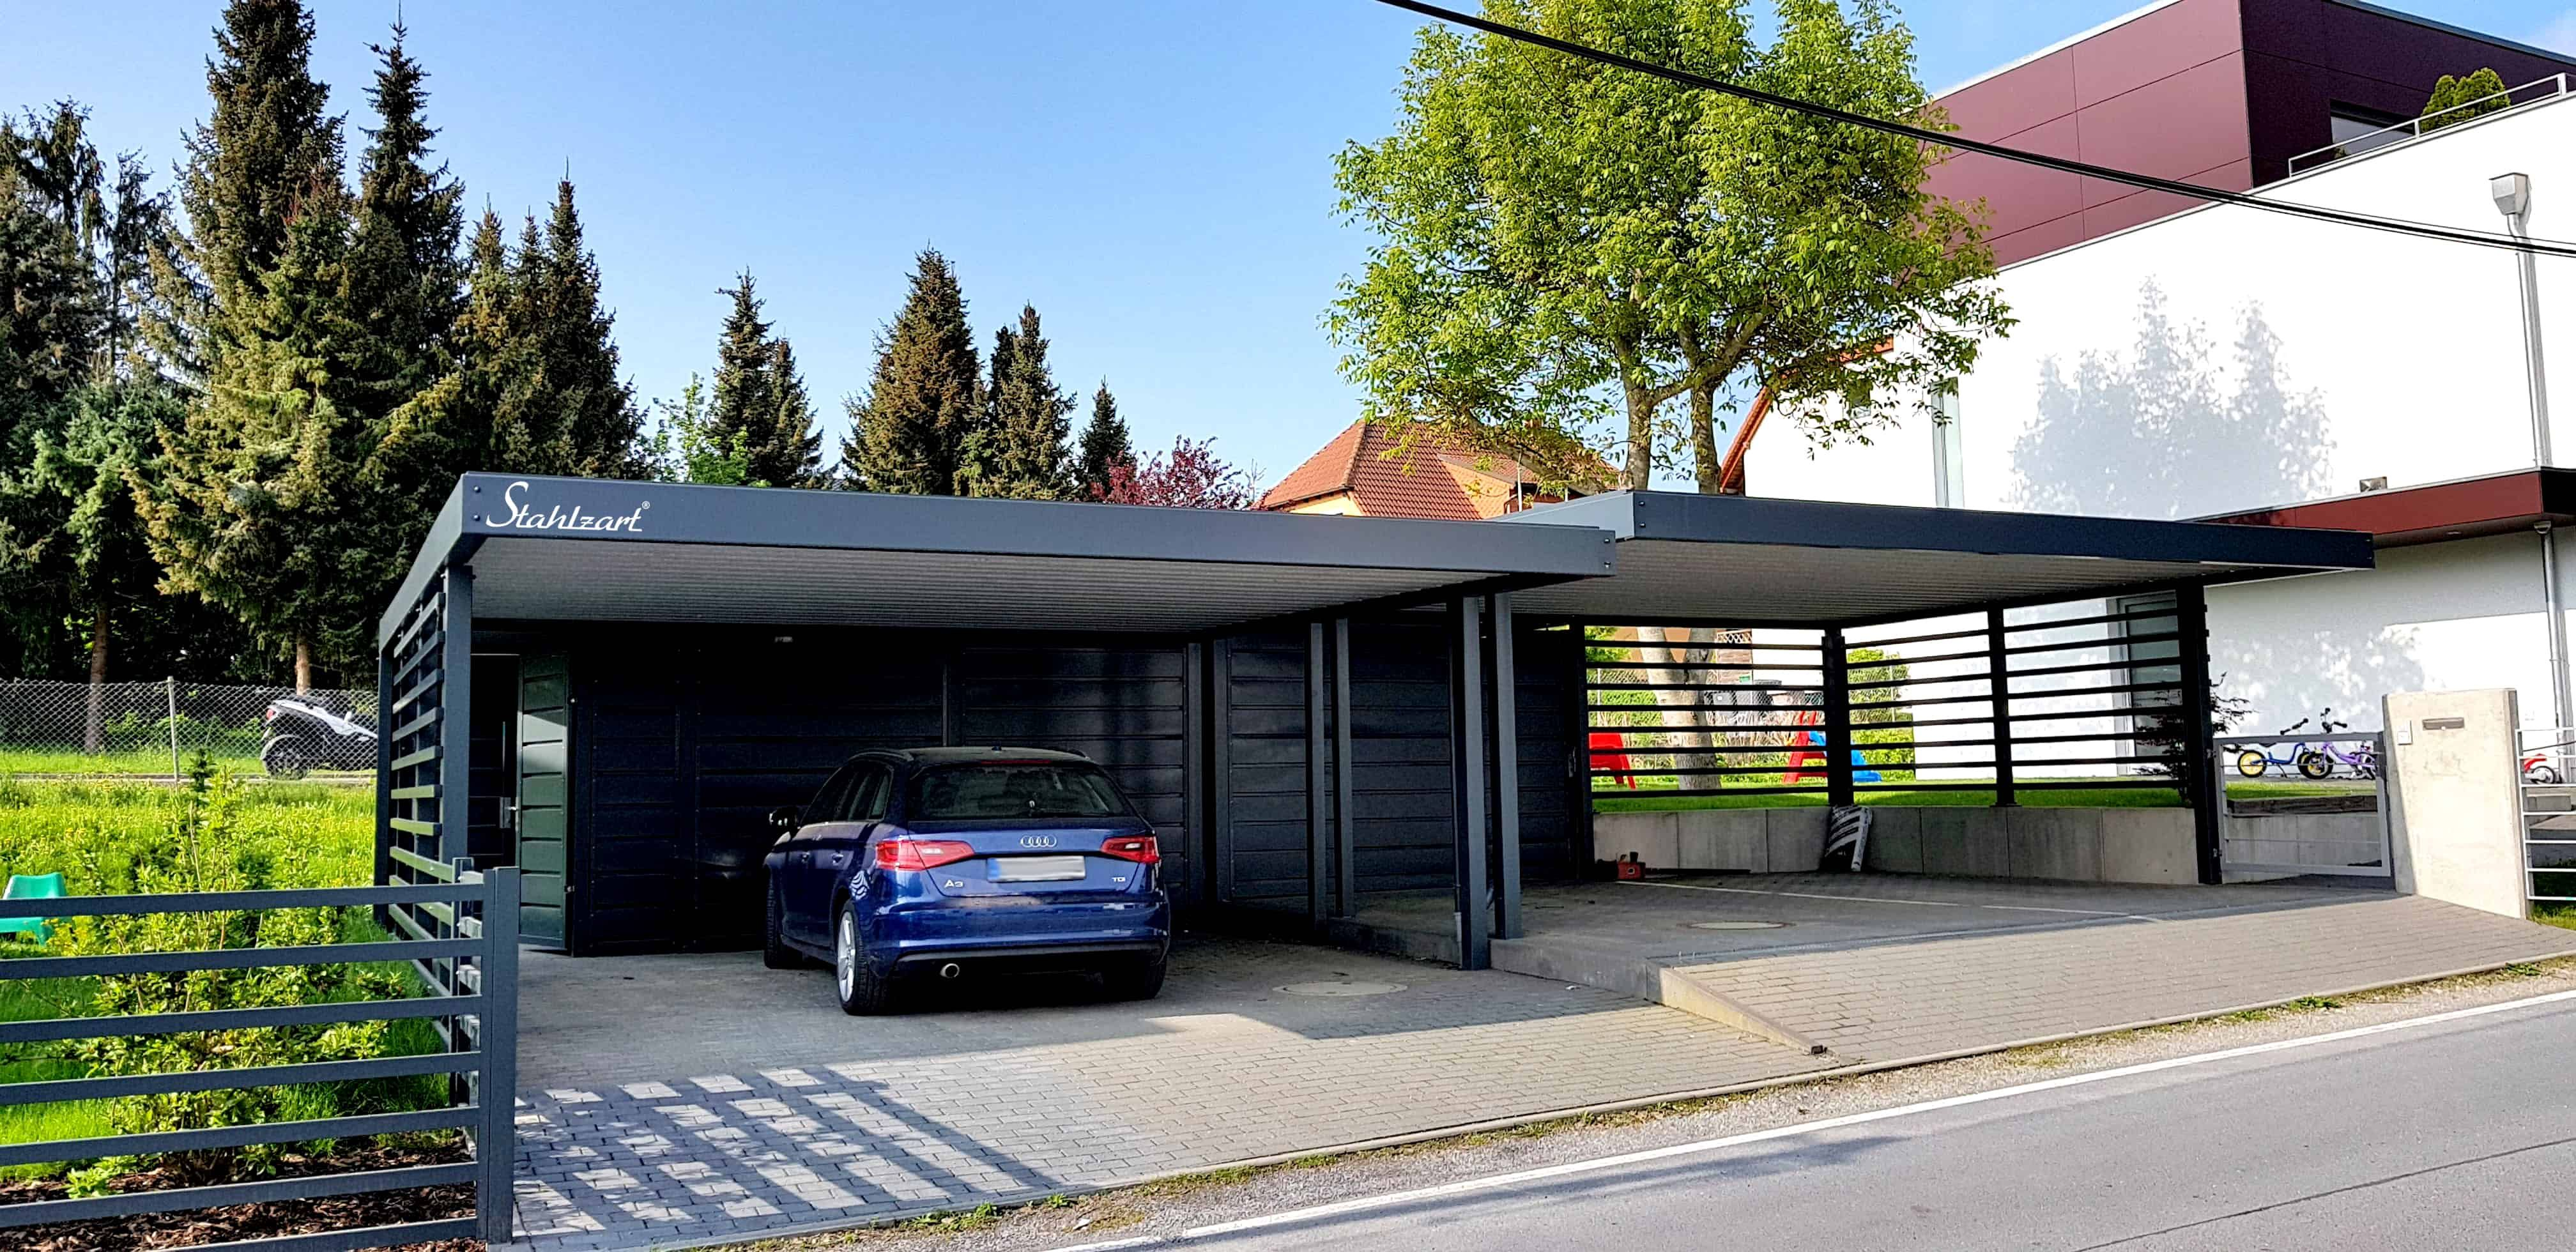 Stahlzart Carport Design Studio · Carport Metall Stahl